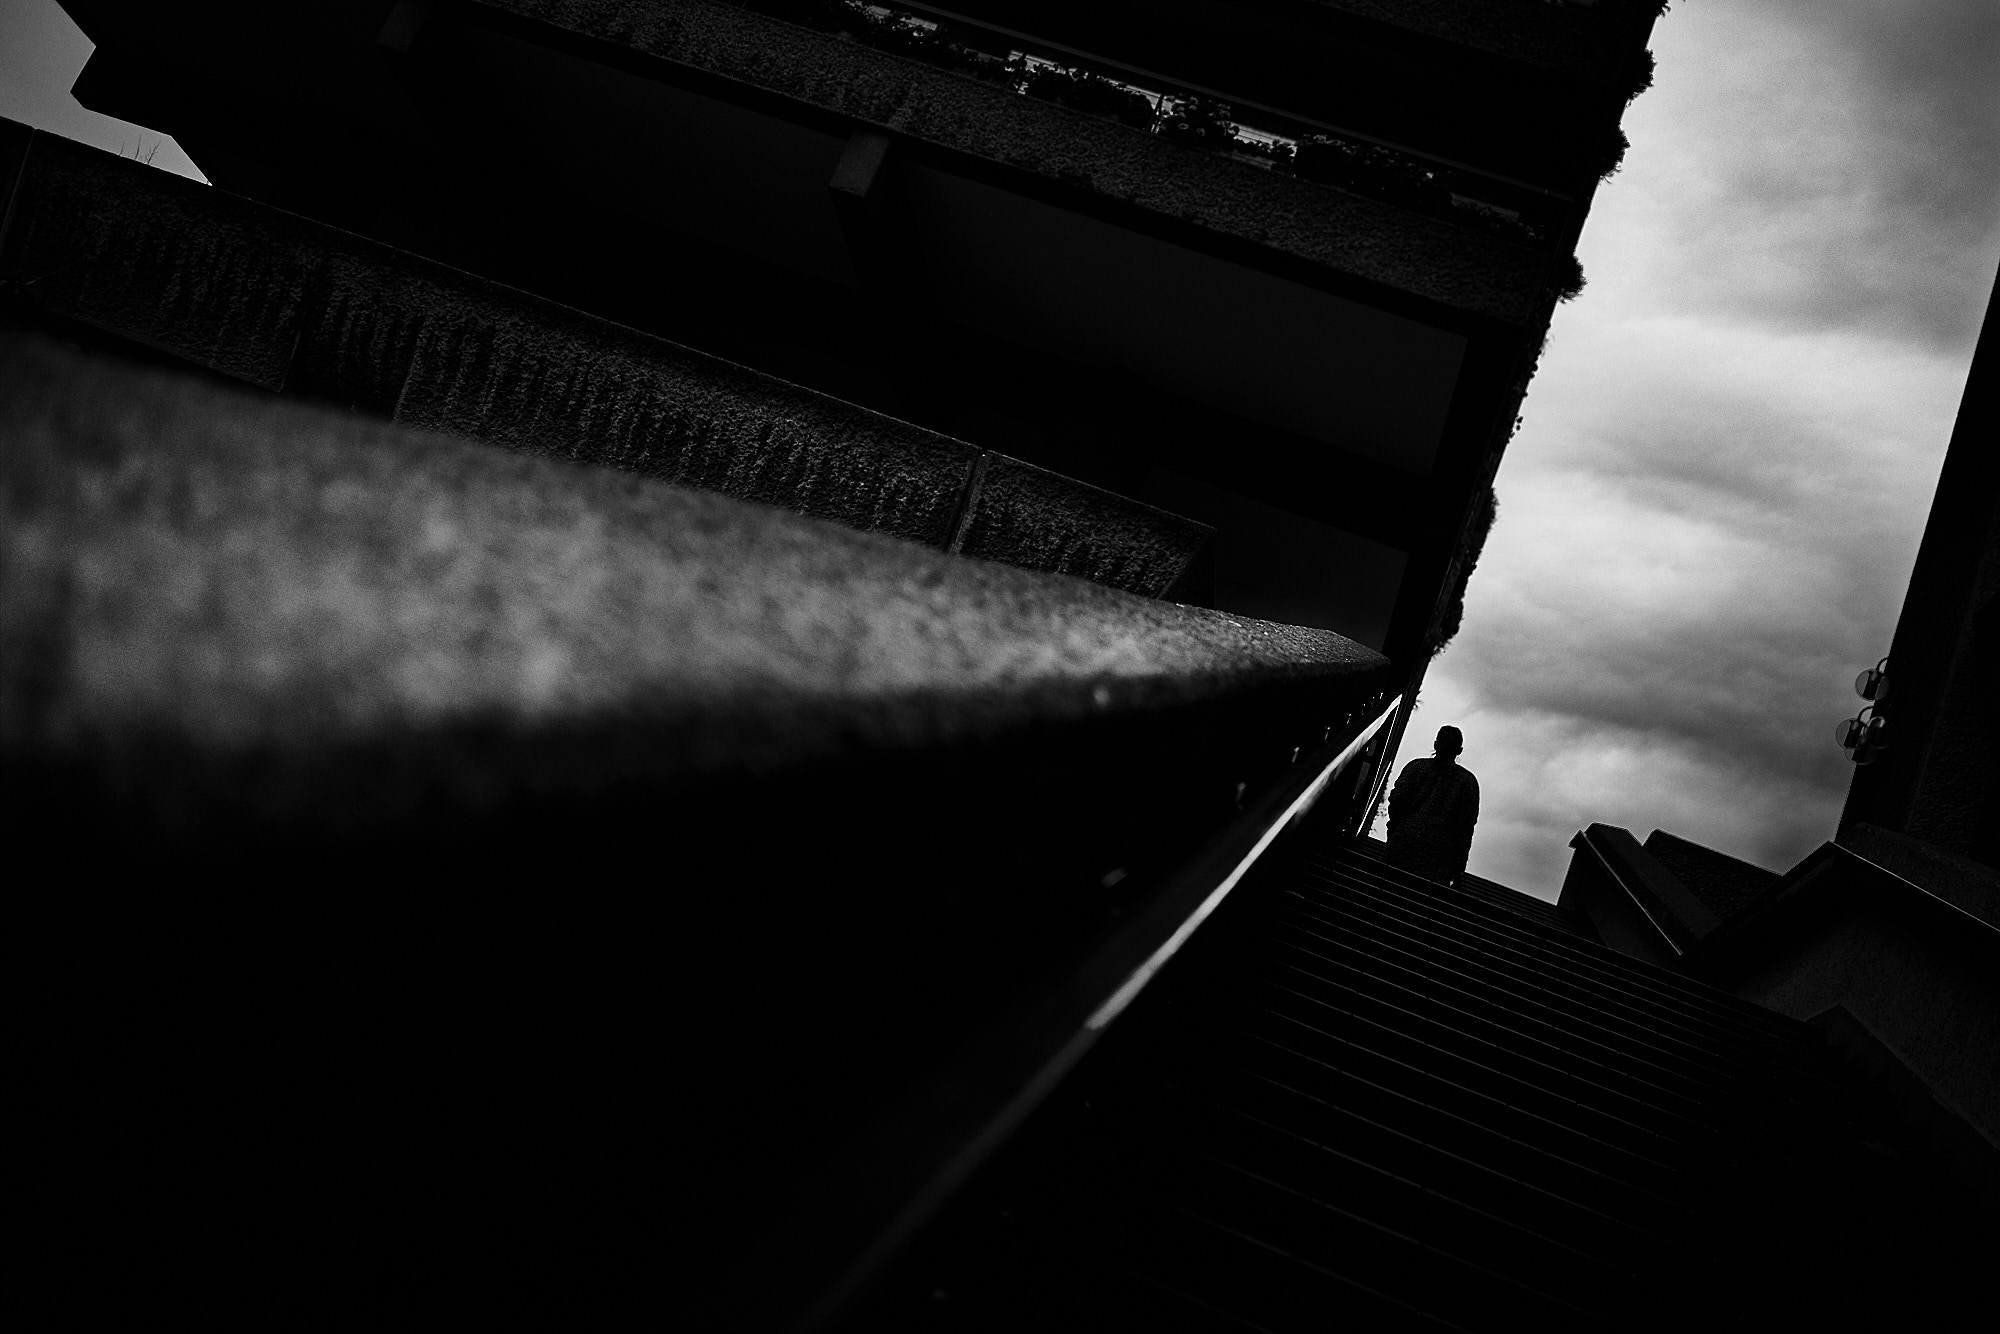 stairs teta sony a7